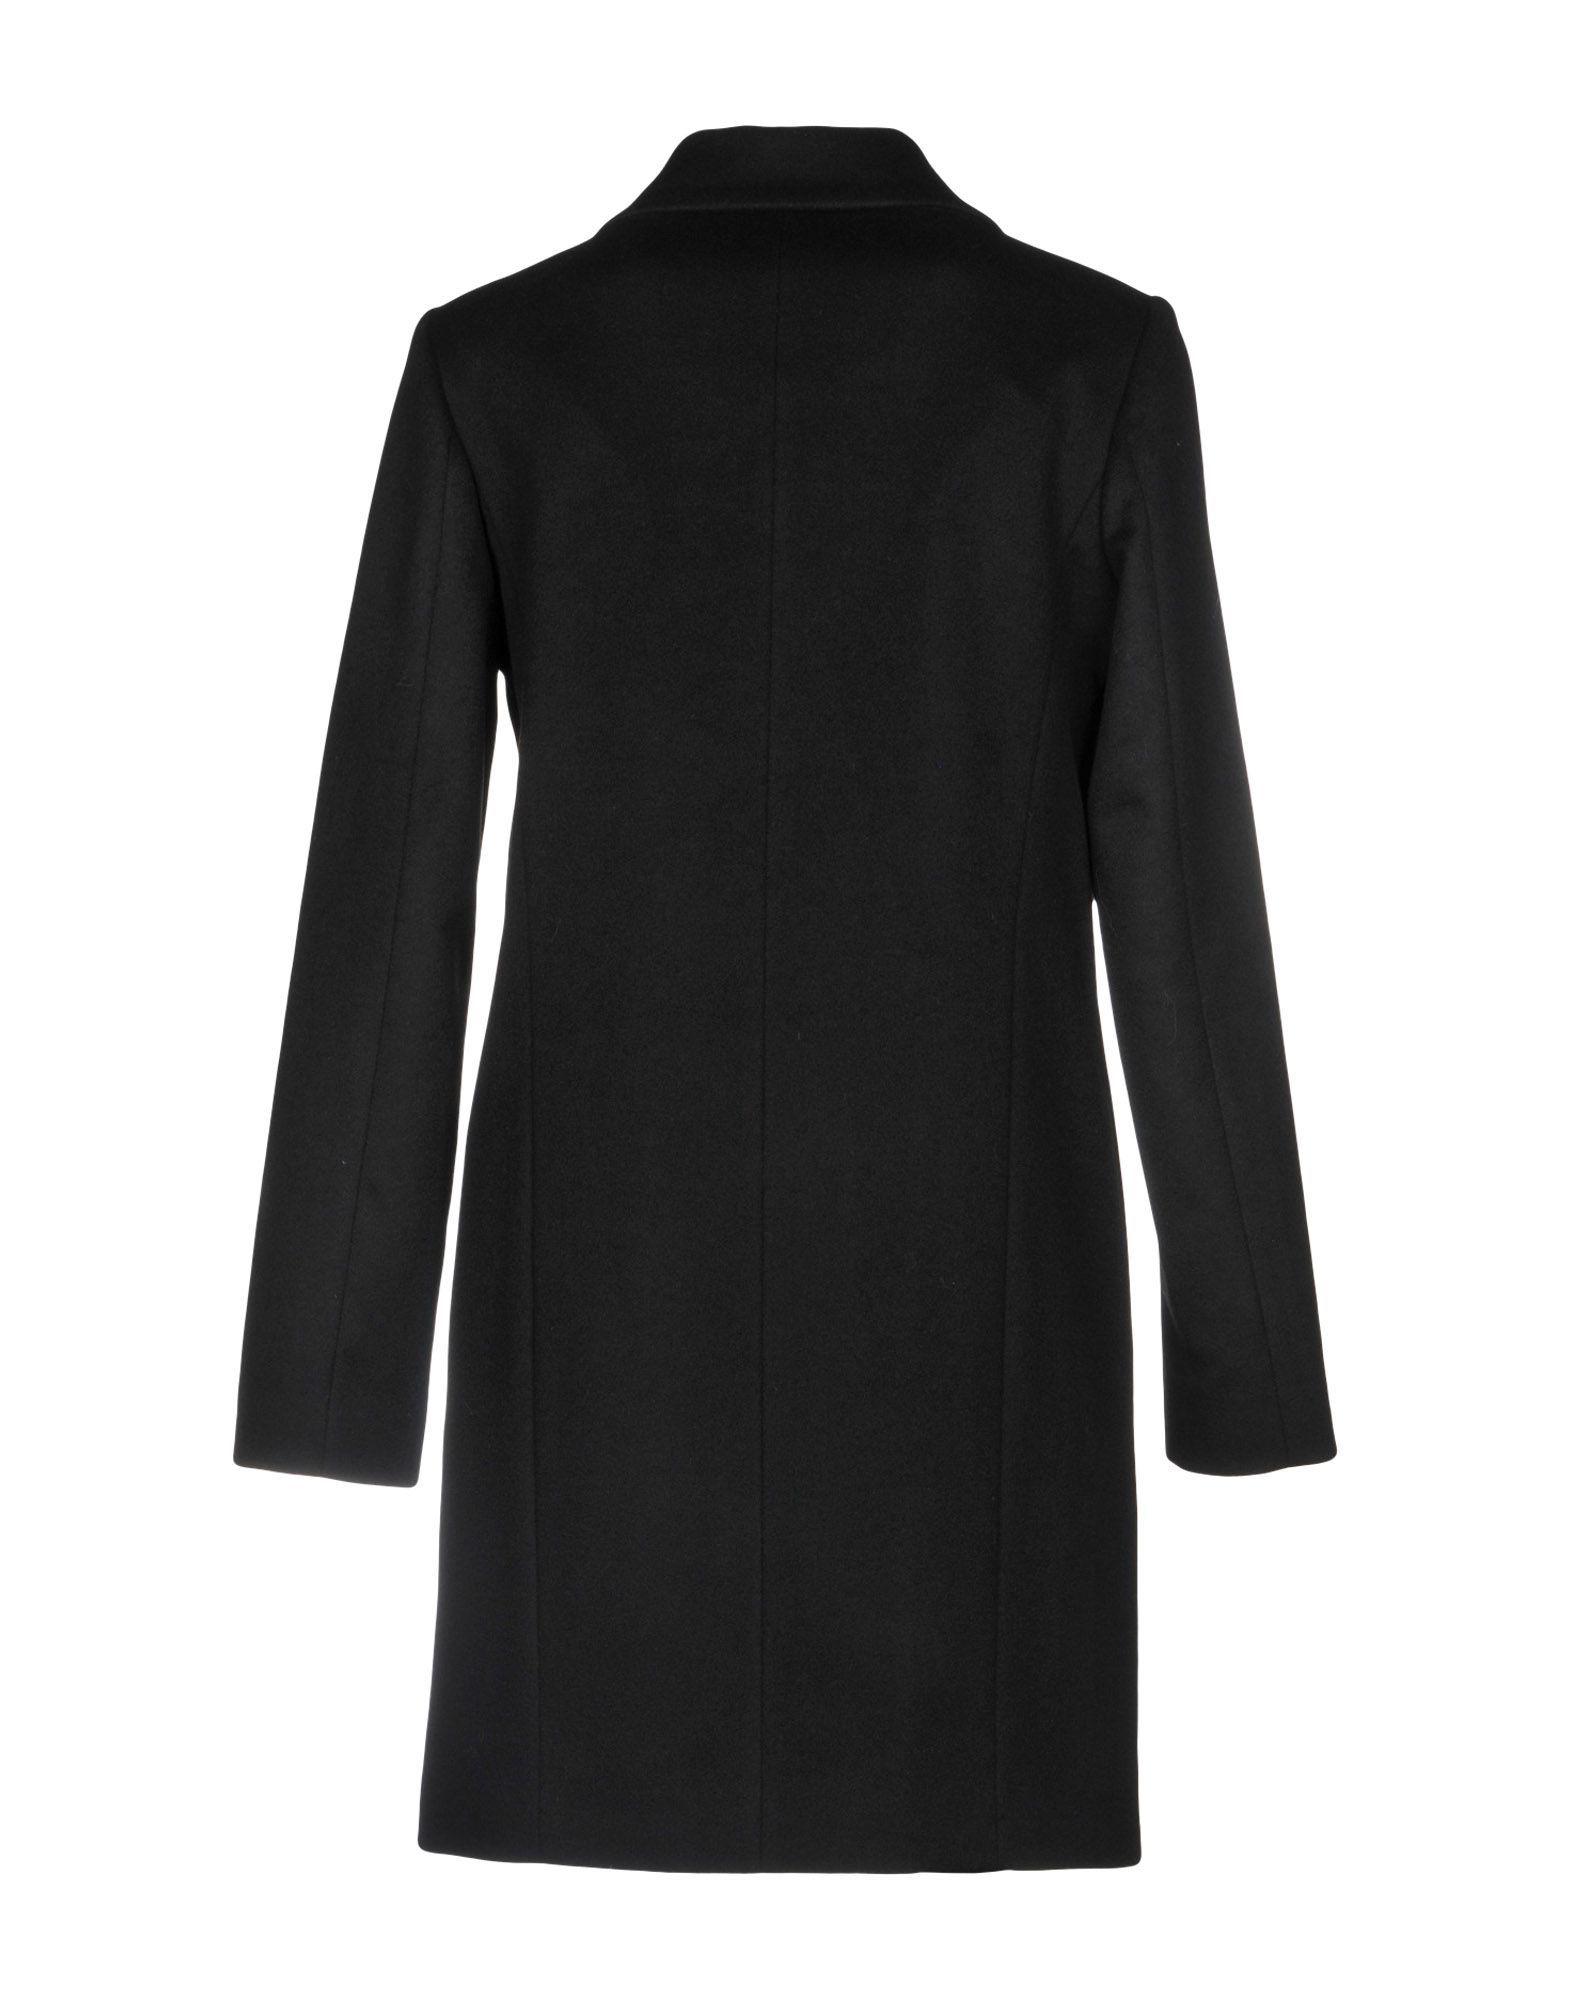 COATS & JACKETS Annie P. Black Woman Wool